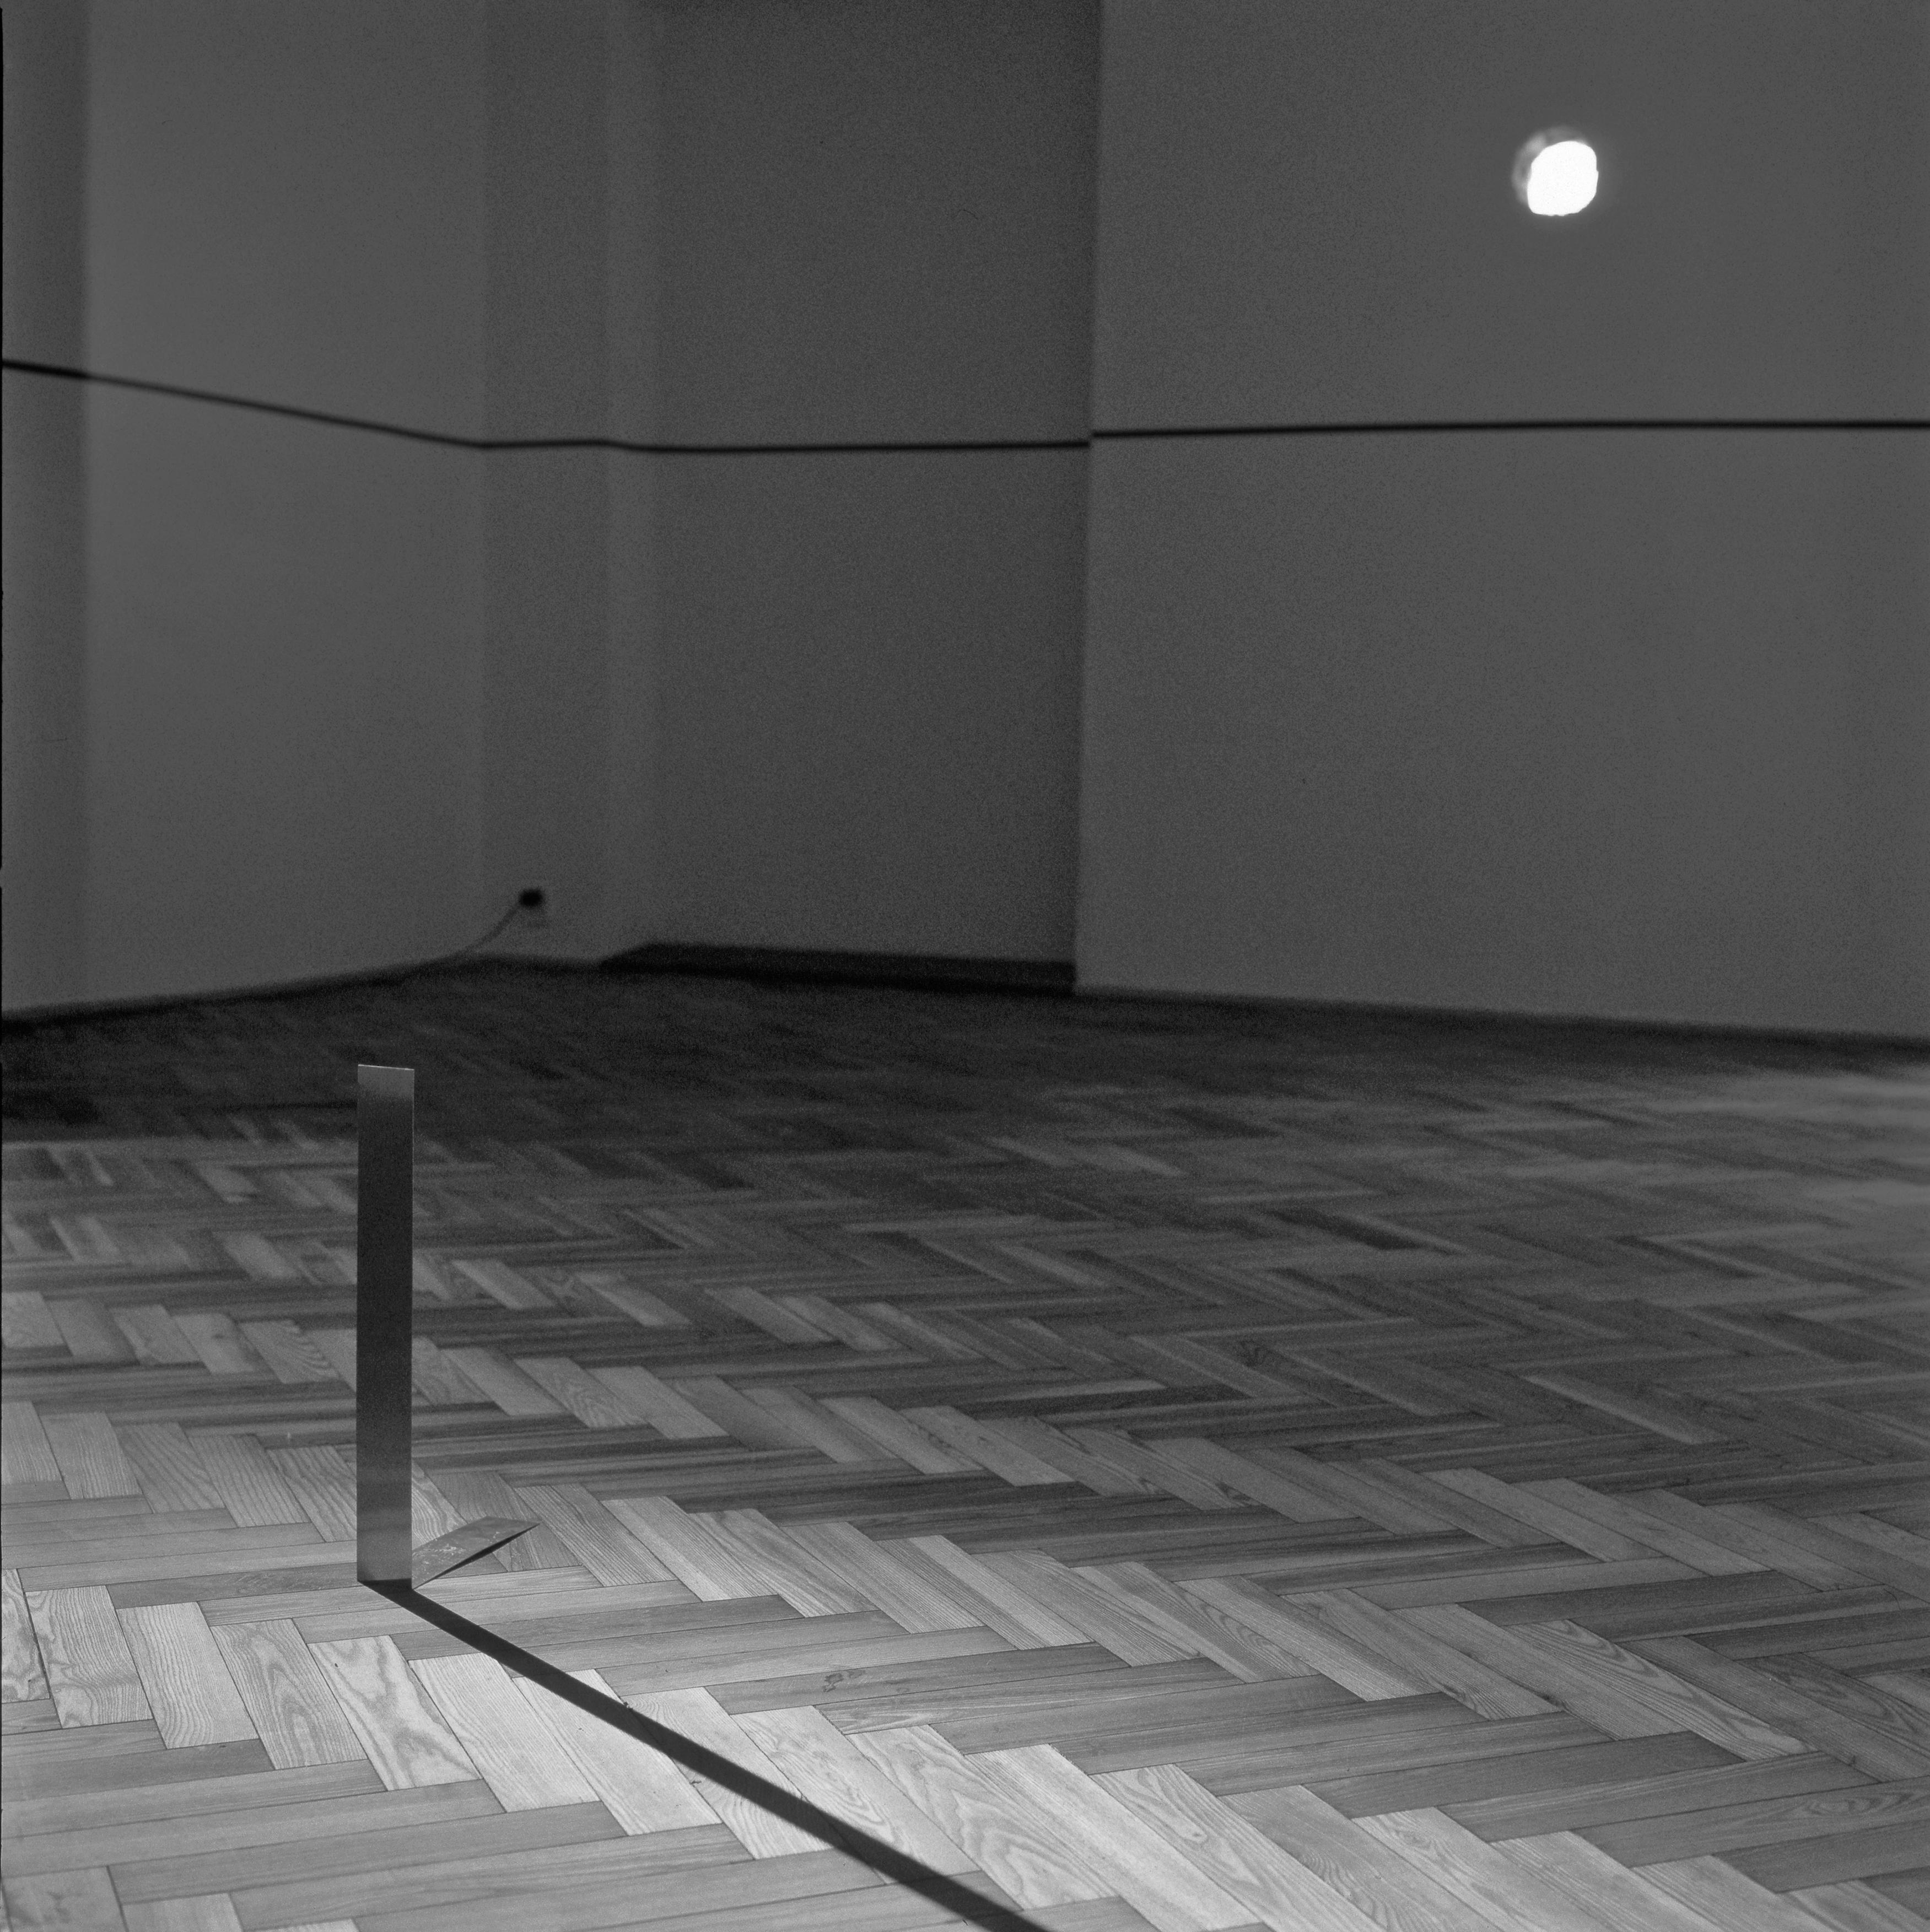 Koji Kamoji, Niebieski pasek icień, Galeria Foksal, 2004